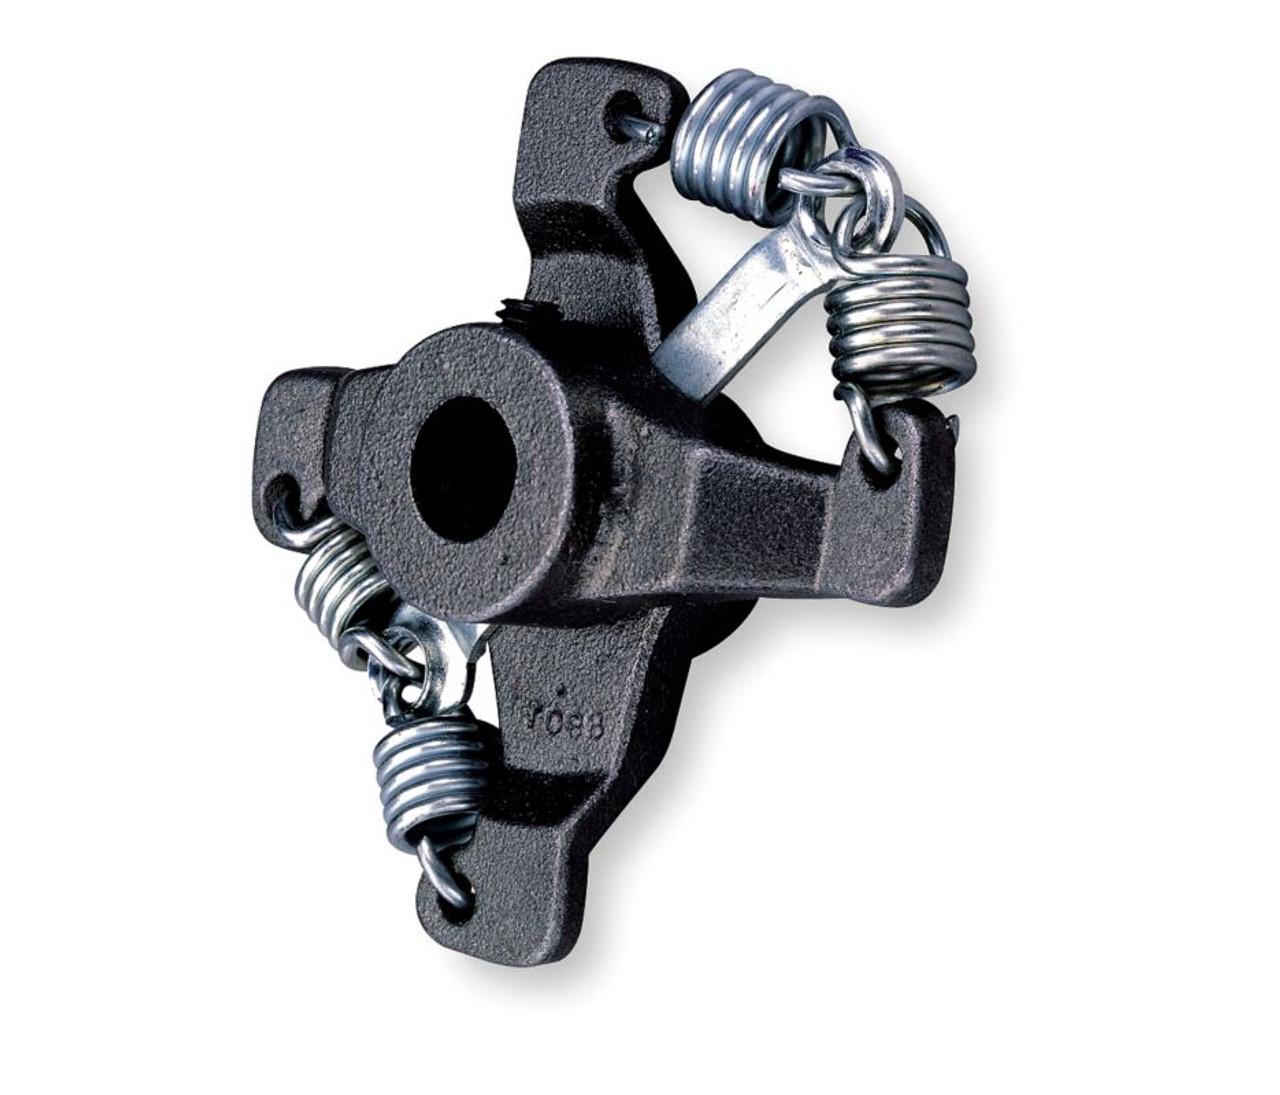 Spring Coupler ARMSTRONG PUMPS INC 806026-001